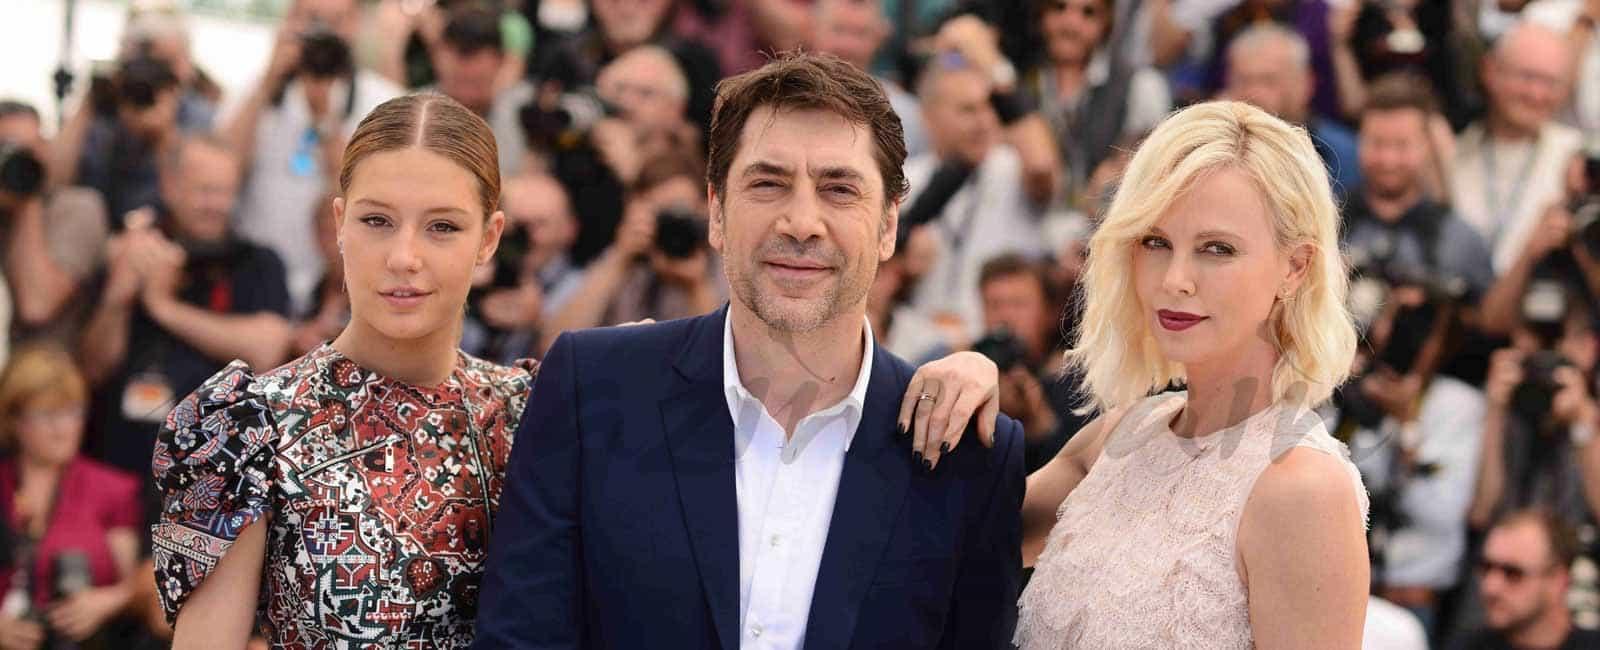 Última alfombra roja del Festival de Cine de Cannes